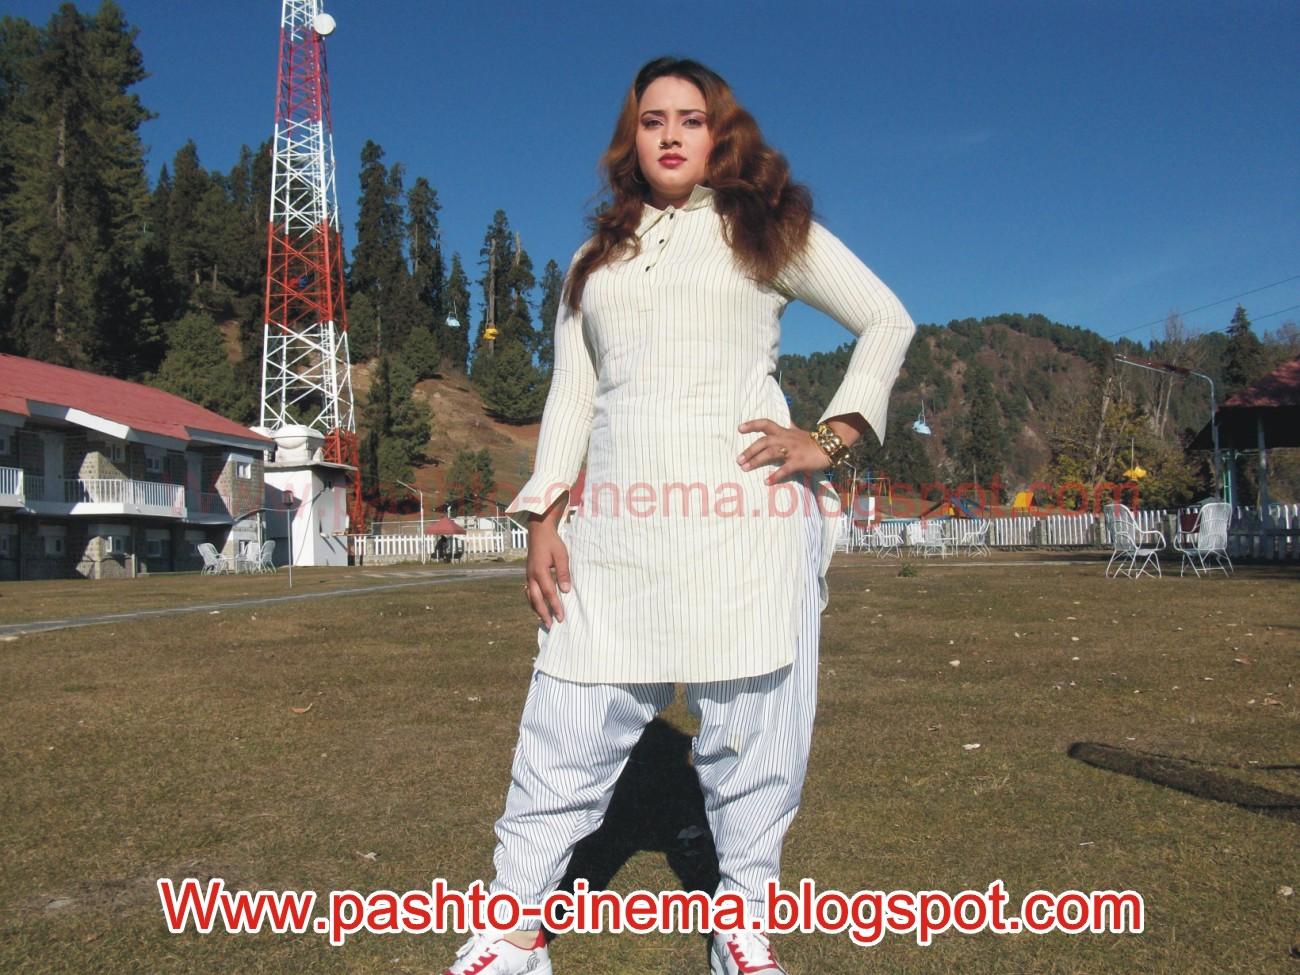 Pashto Dancer Nadia Gul Six: Pashto Songs: Dancer